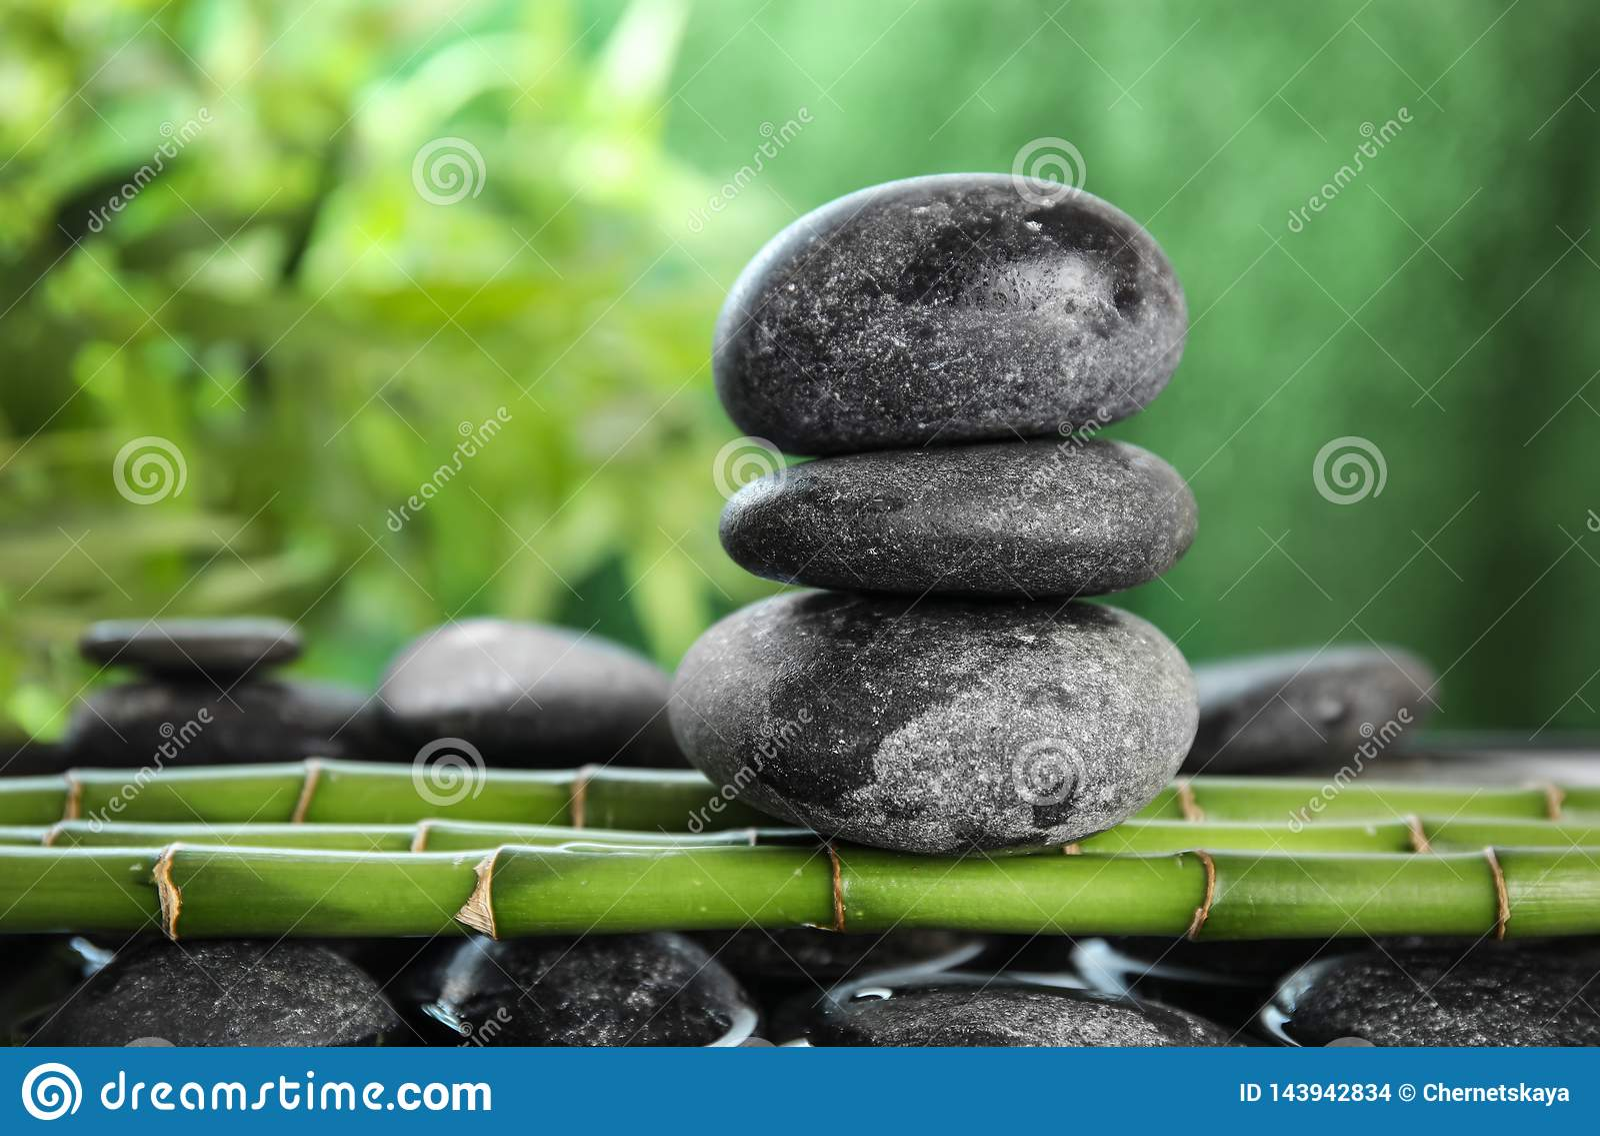 Zen stones on bamboo against background